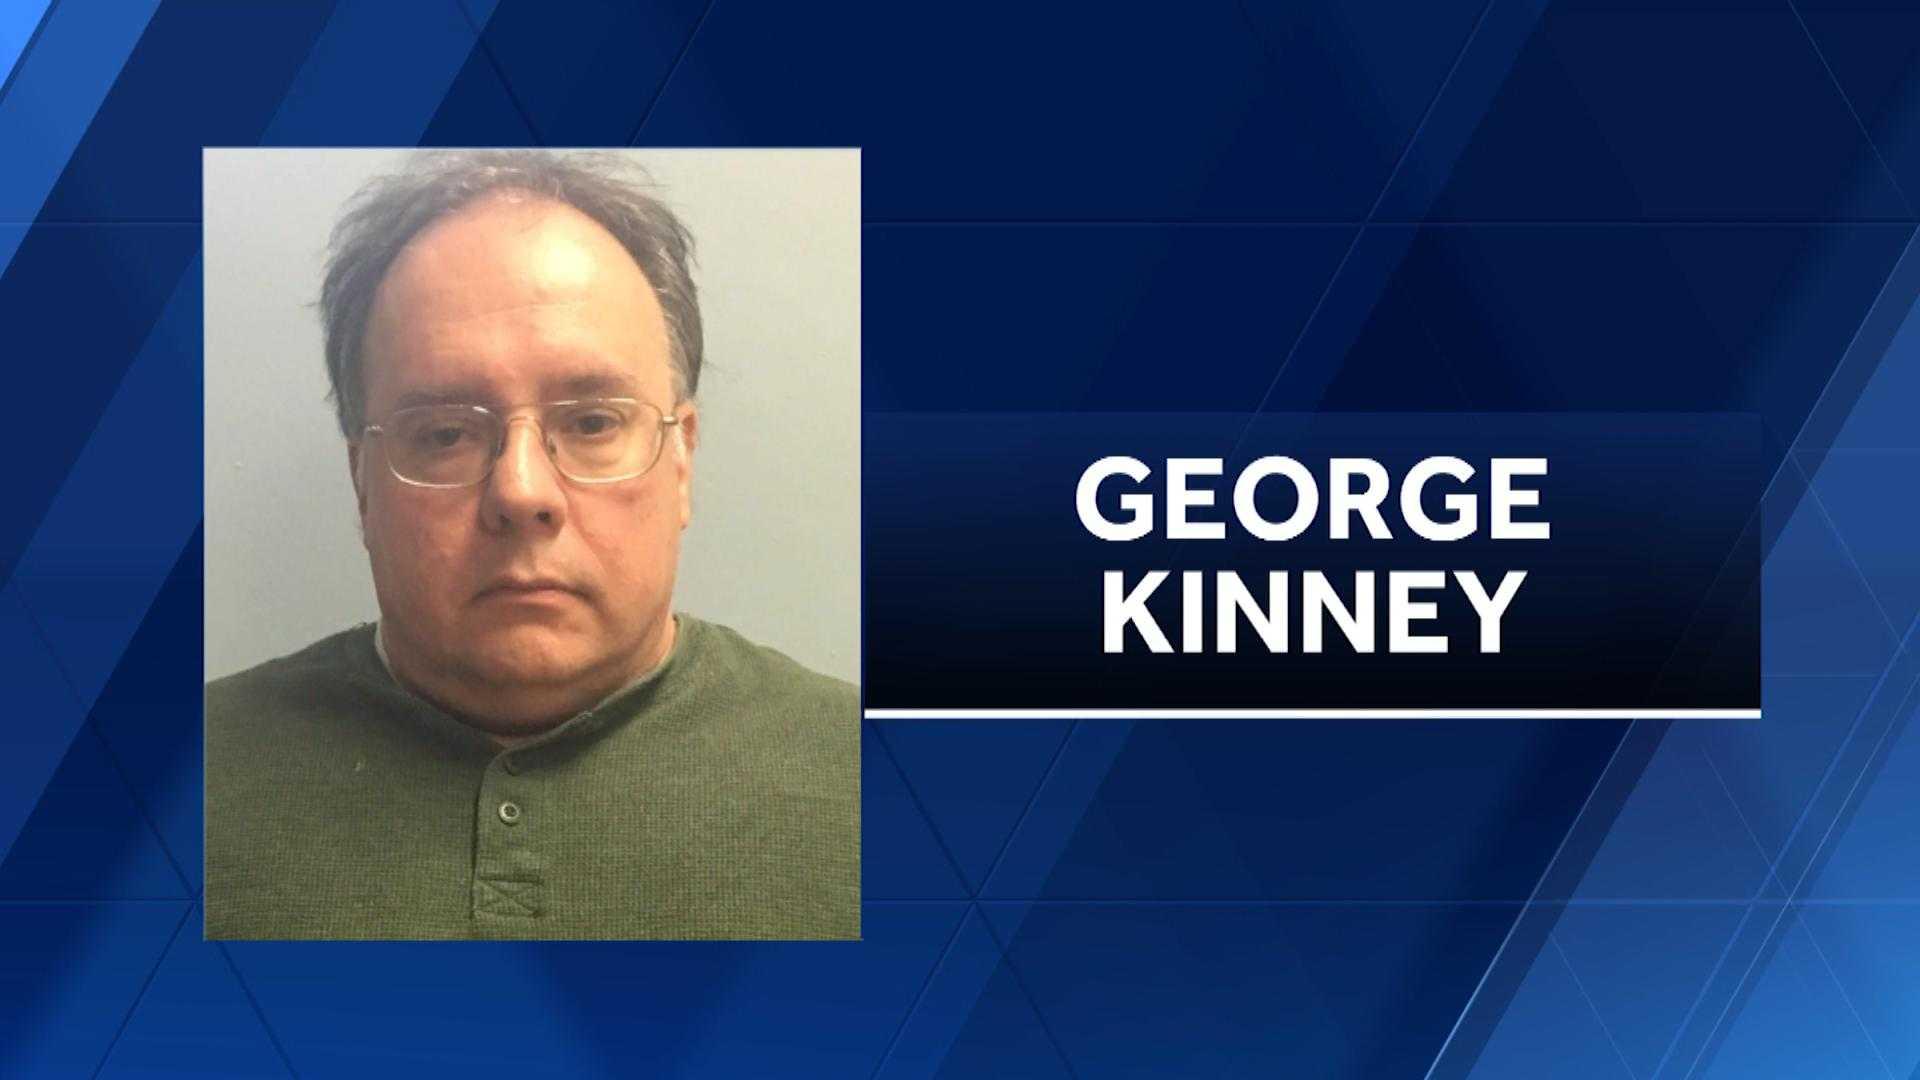 George Kinney